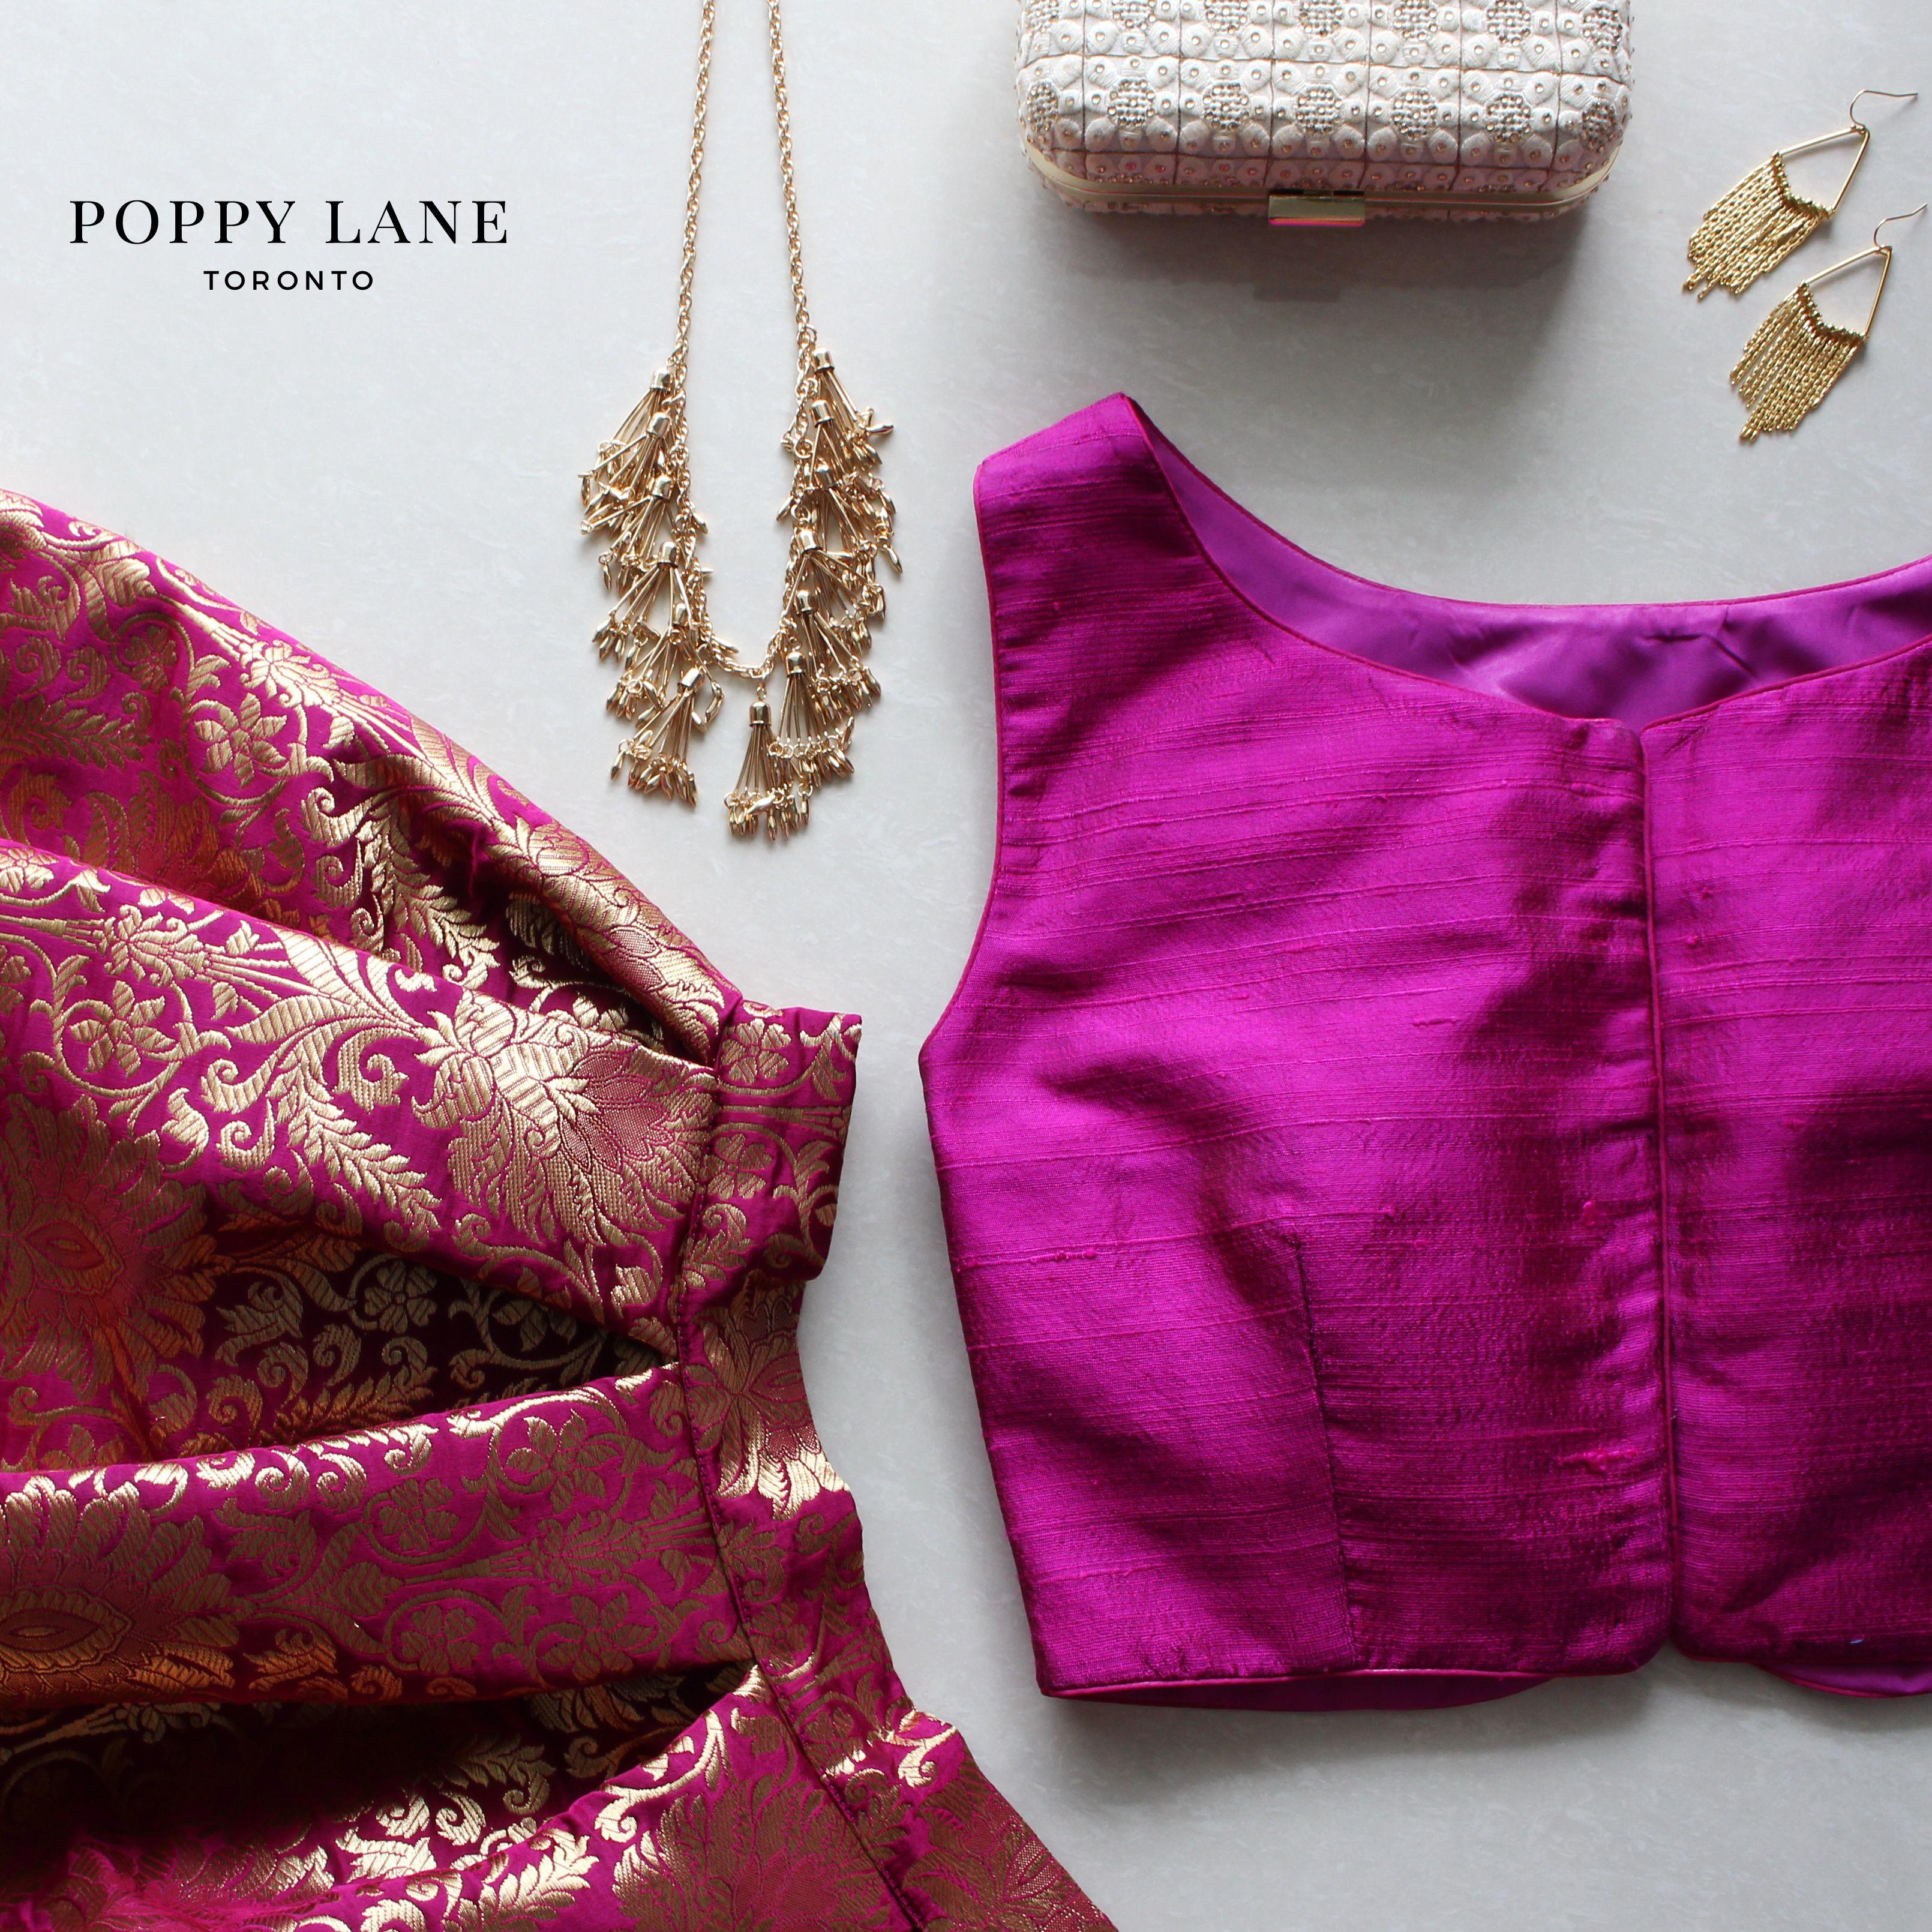 cf33ff5f069b7 Simple Raw Silk Purple Blouses - Shop now at poppylane.ca